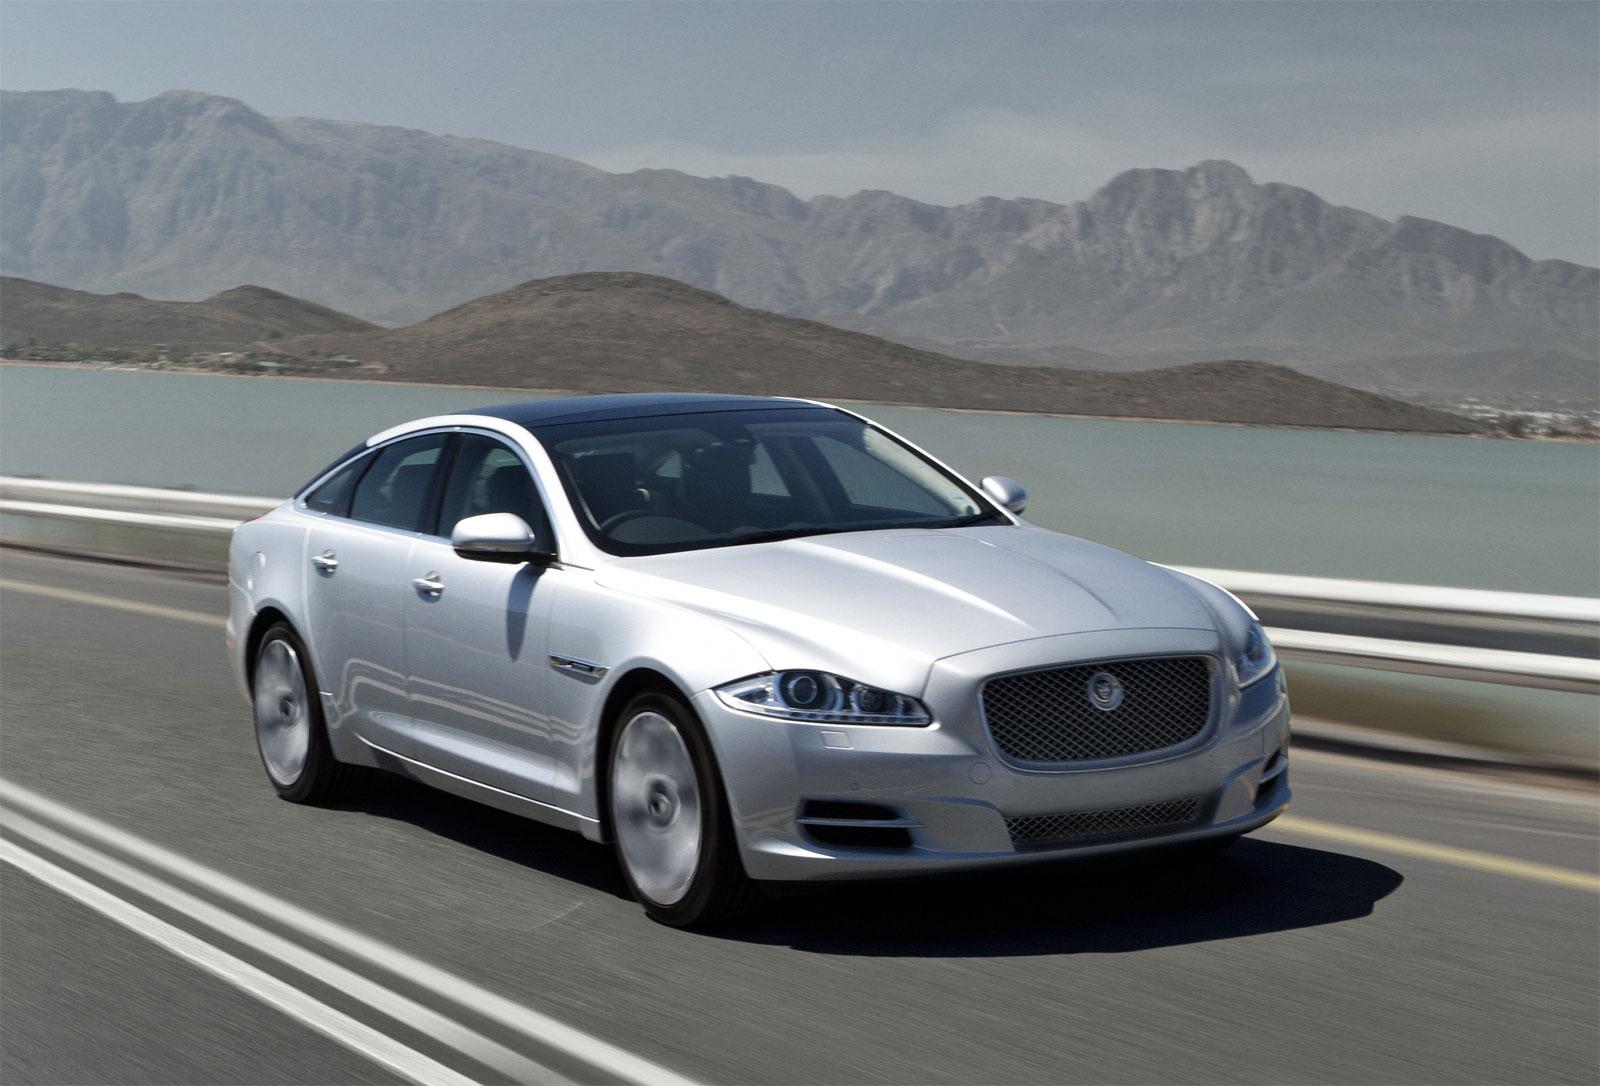 Sport Cars: Jaguar XJL Hd Wallpapers 2012